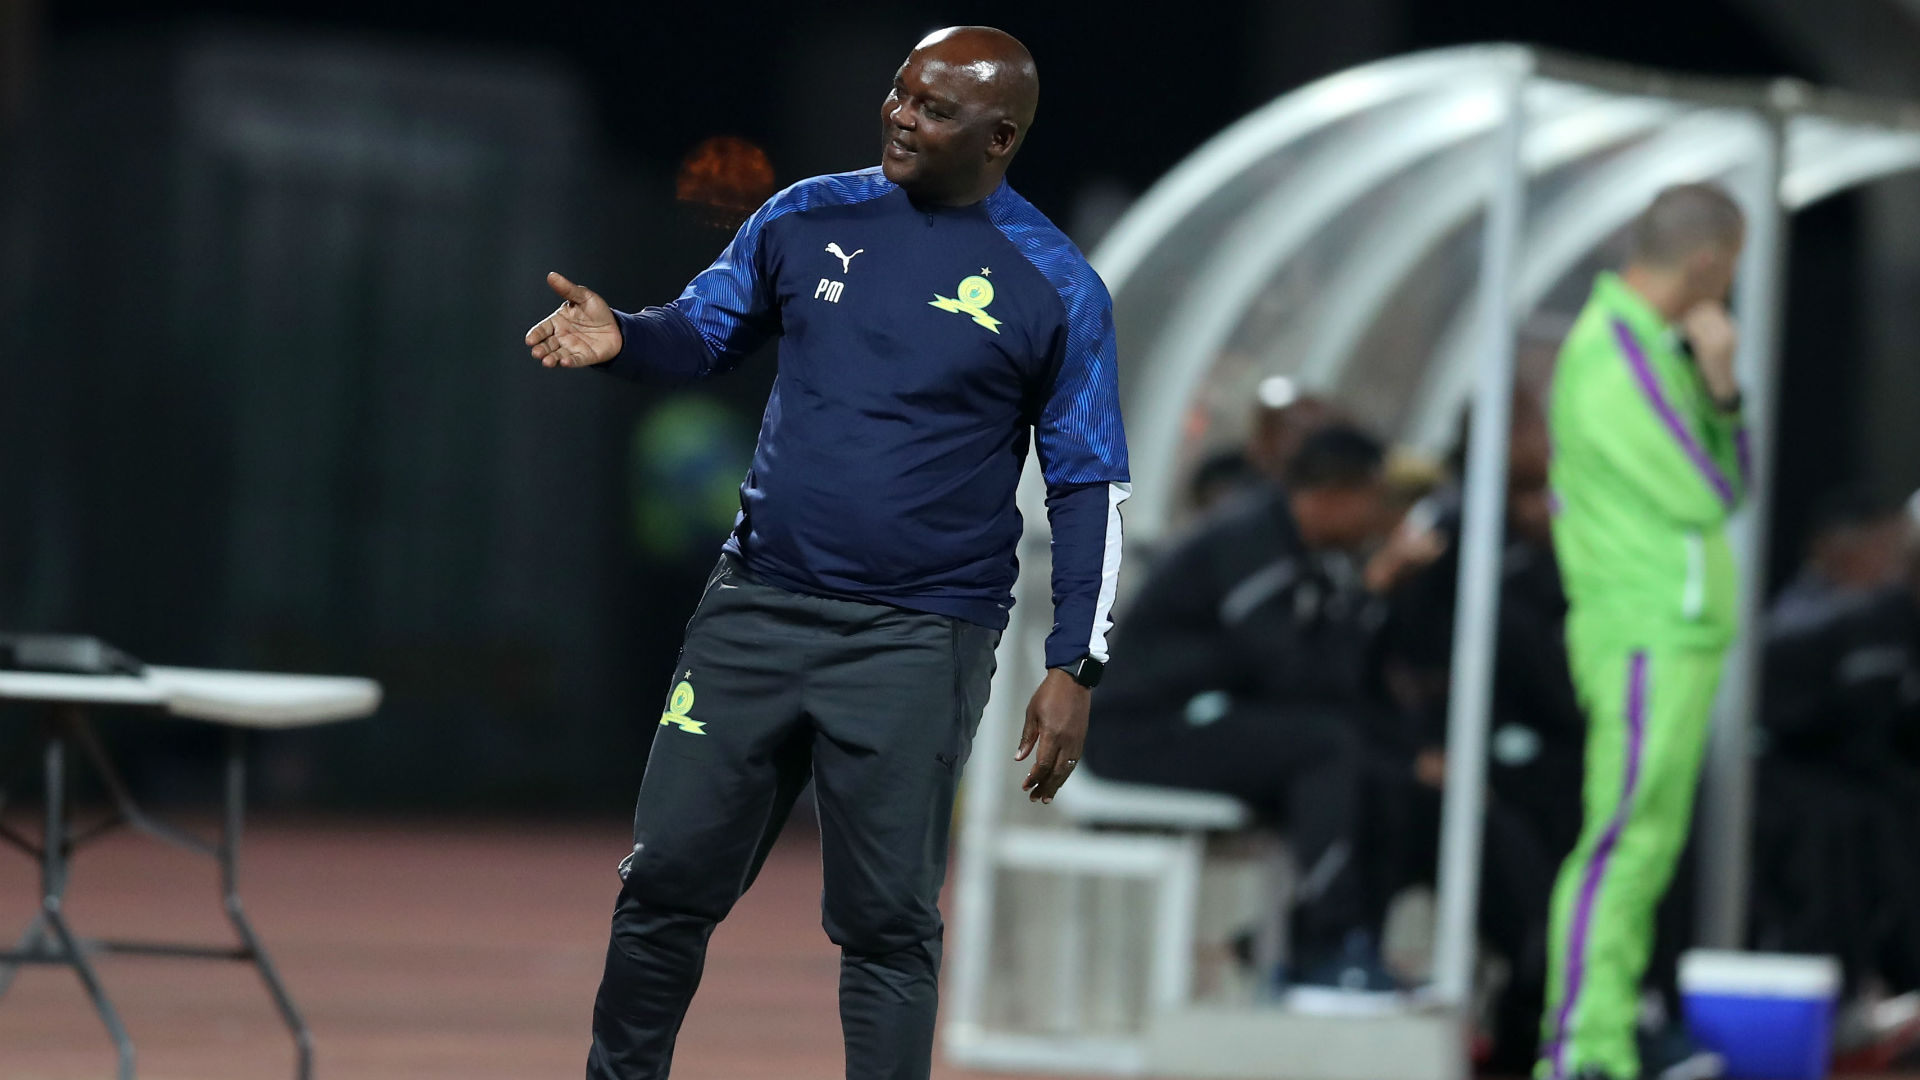 Mamelodi Sundowns can finally focus on catching Kaizer Chiefs – Mosimane